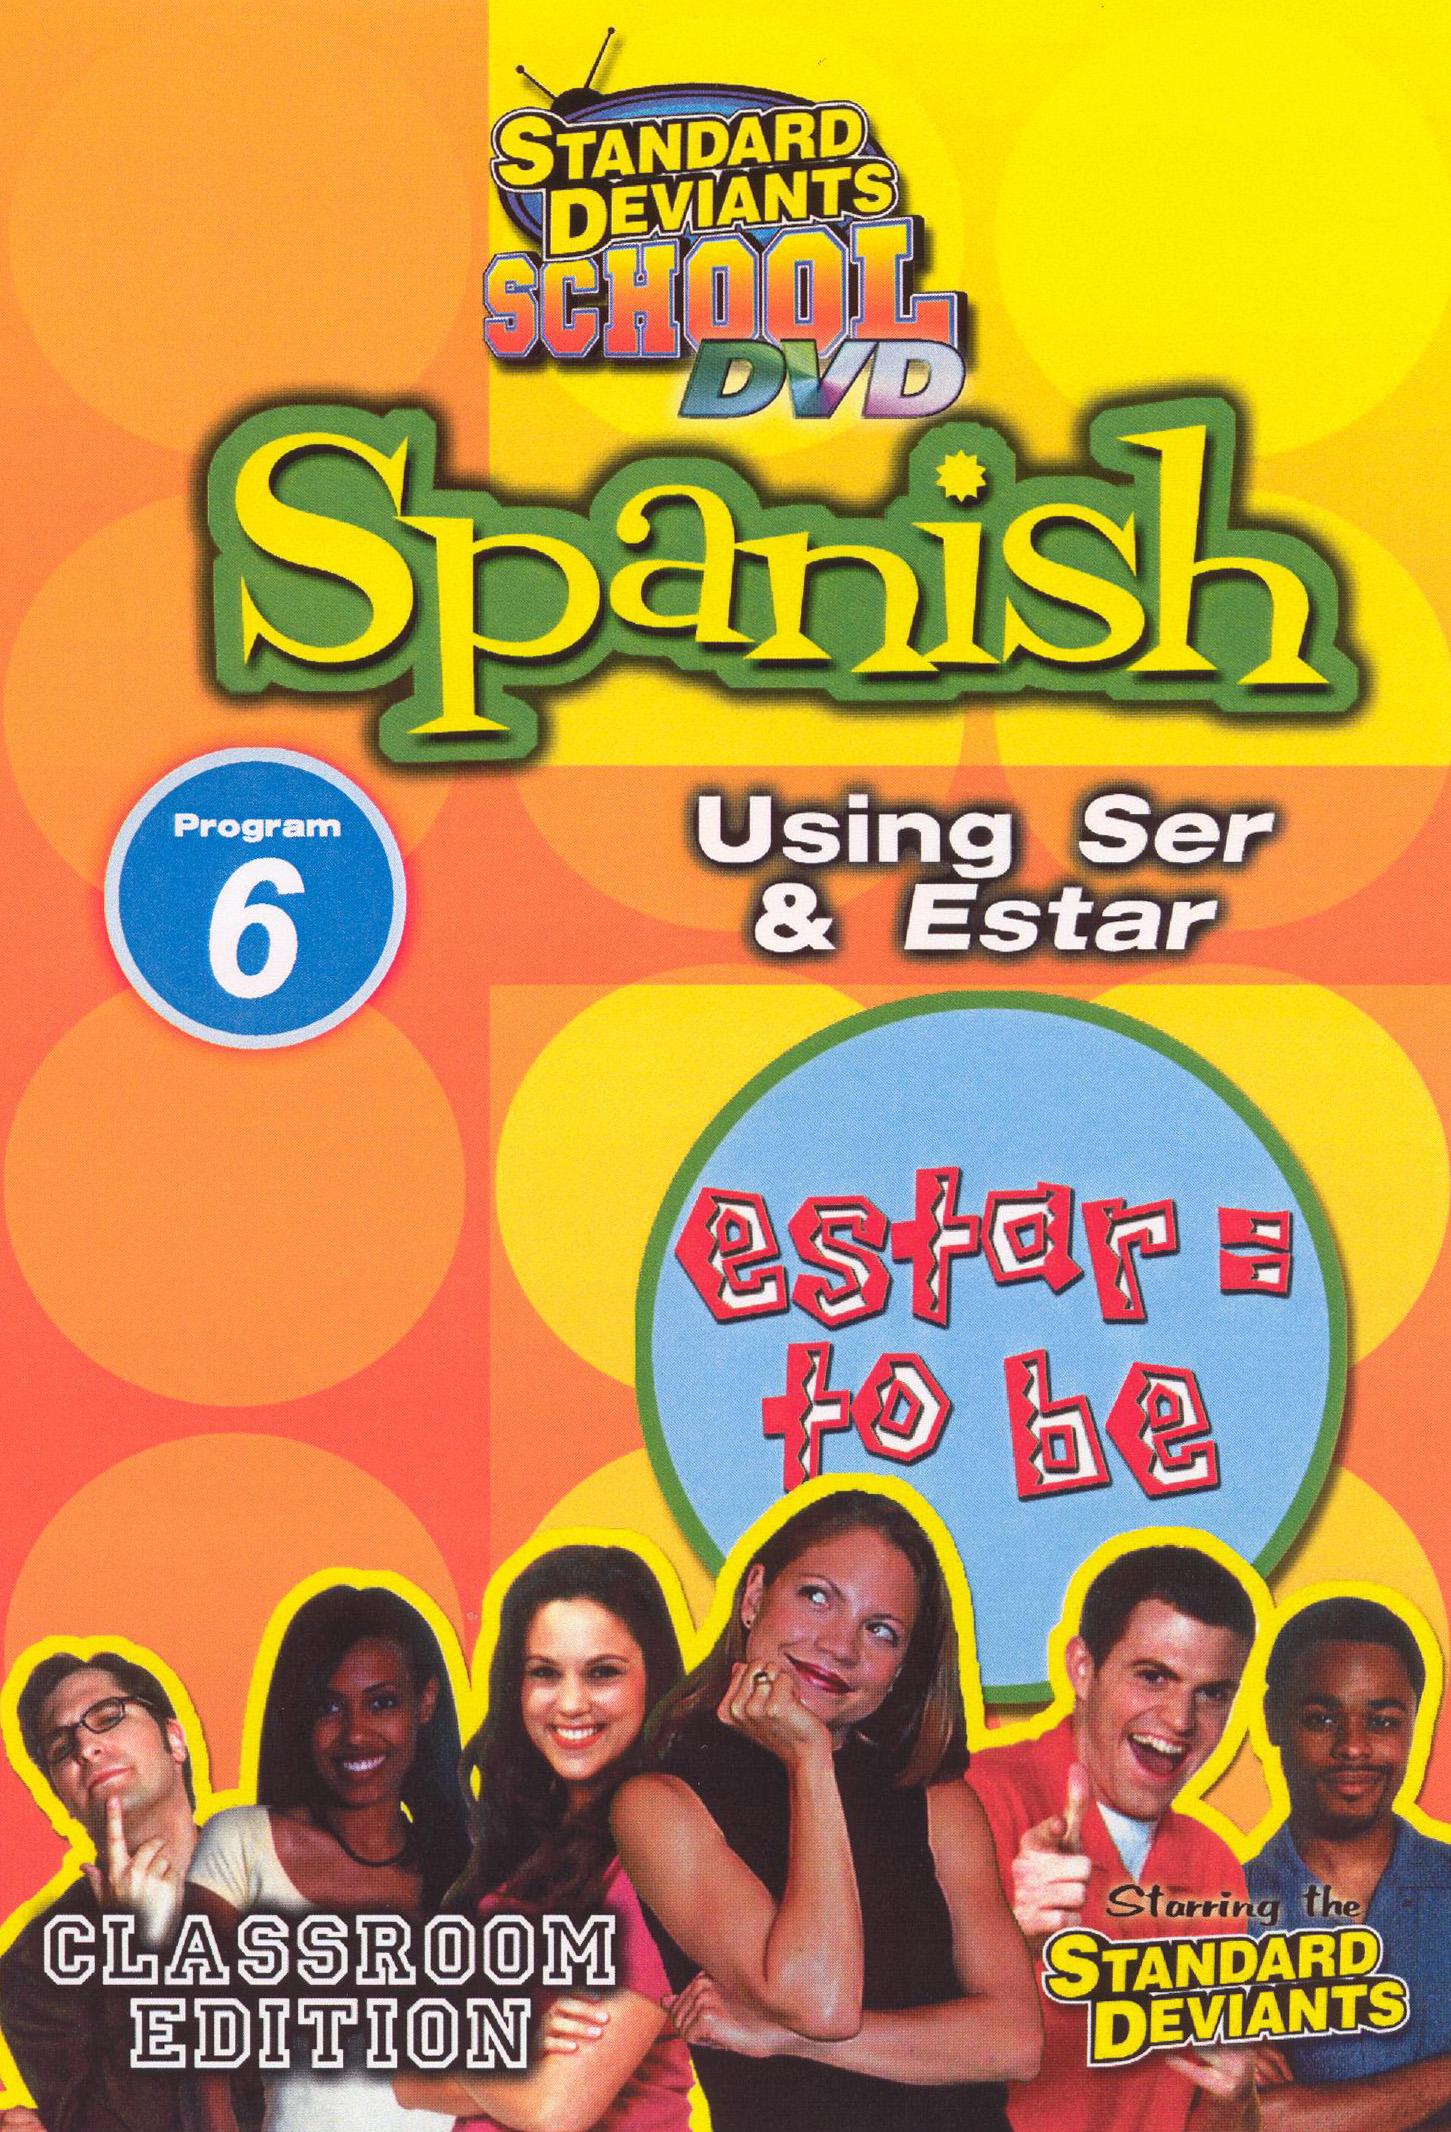 Standard Deviants School: Spanish, Program 6